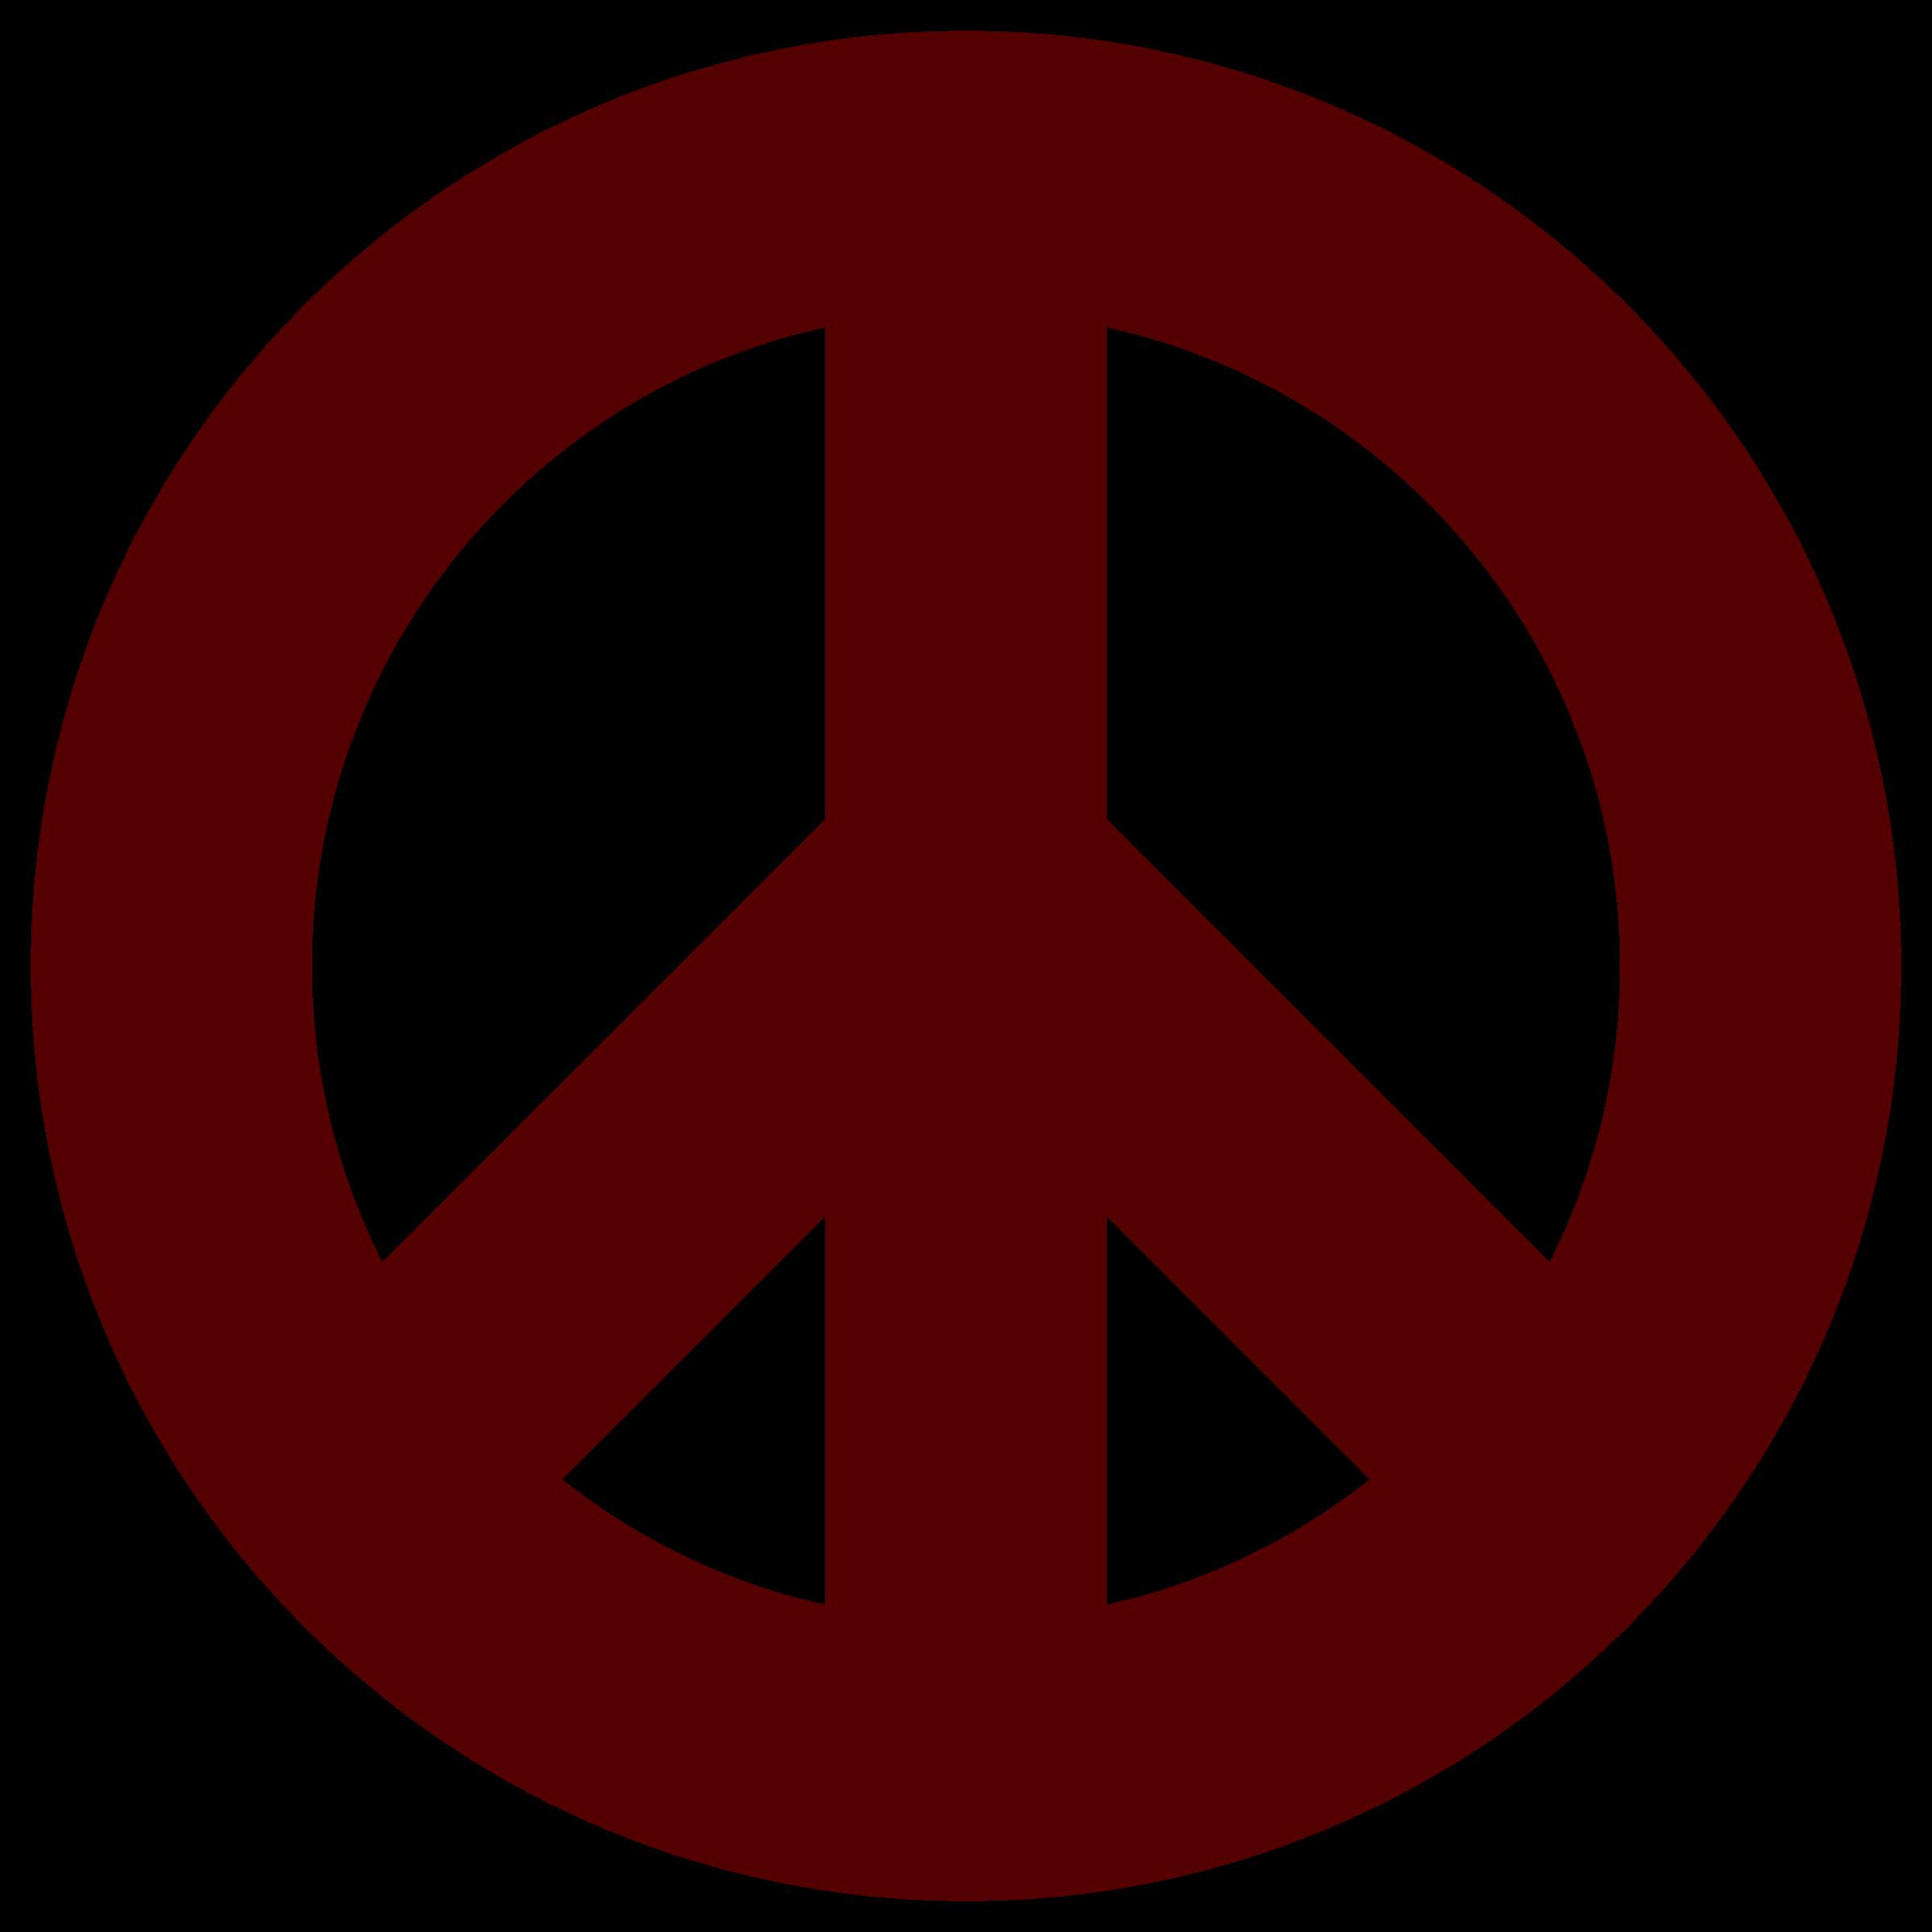 Free Peace Sign Clip Art, Download Free Clip Art, Free Clip.